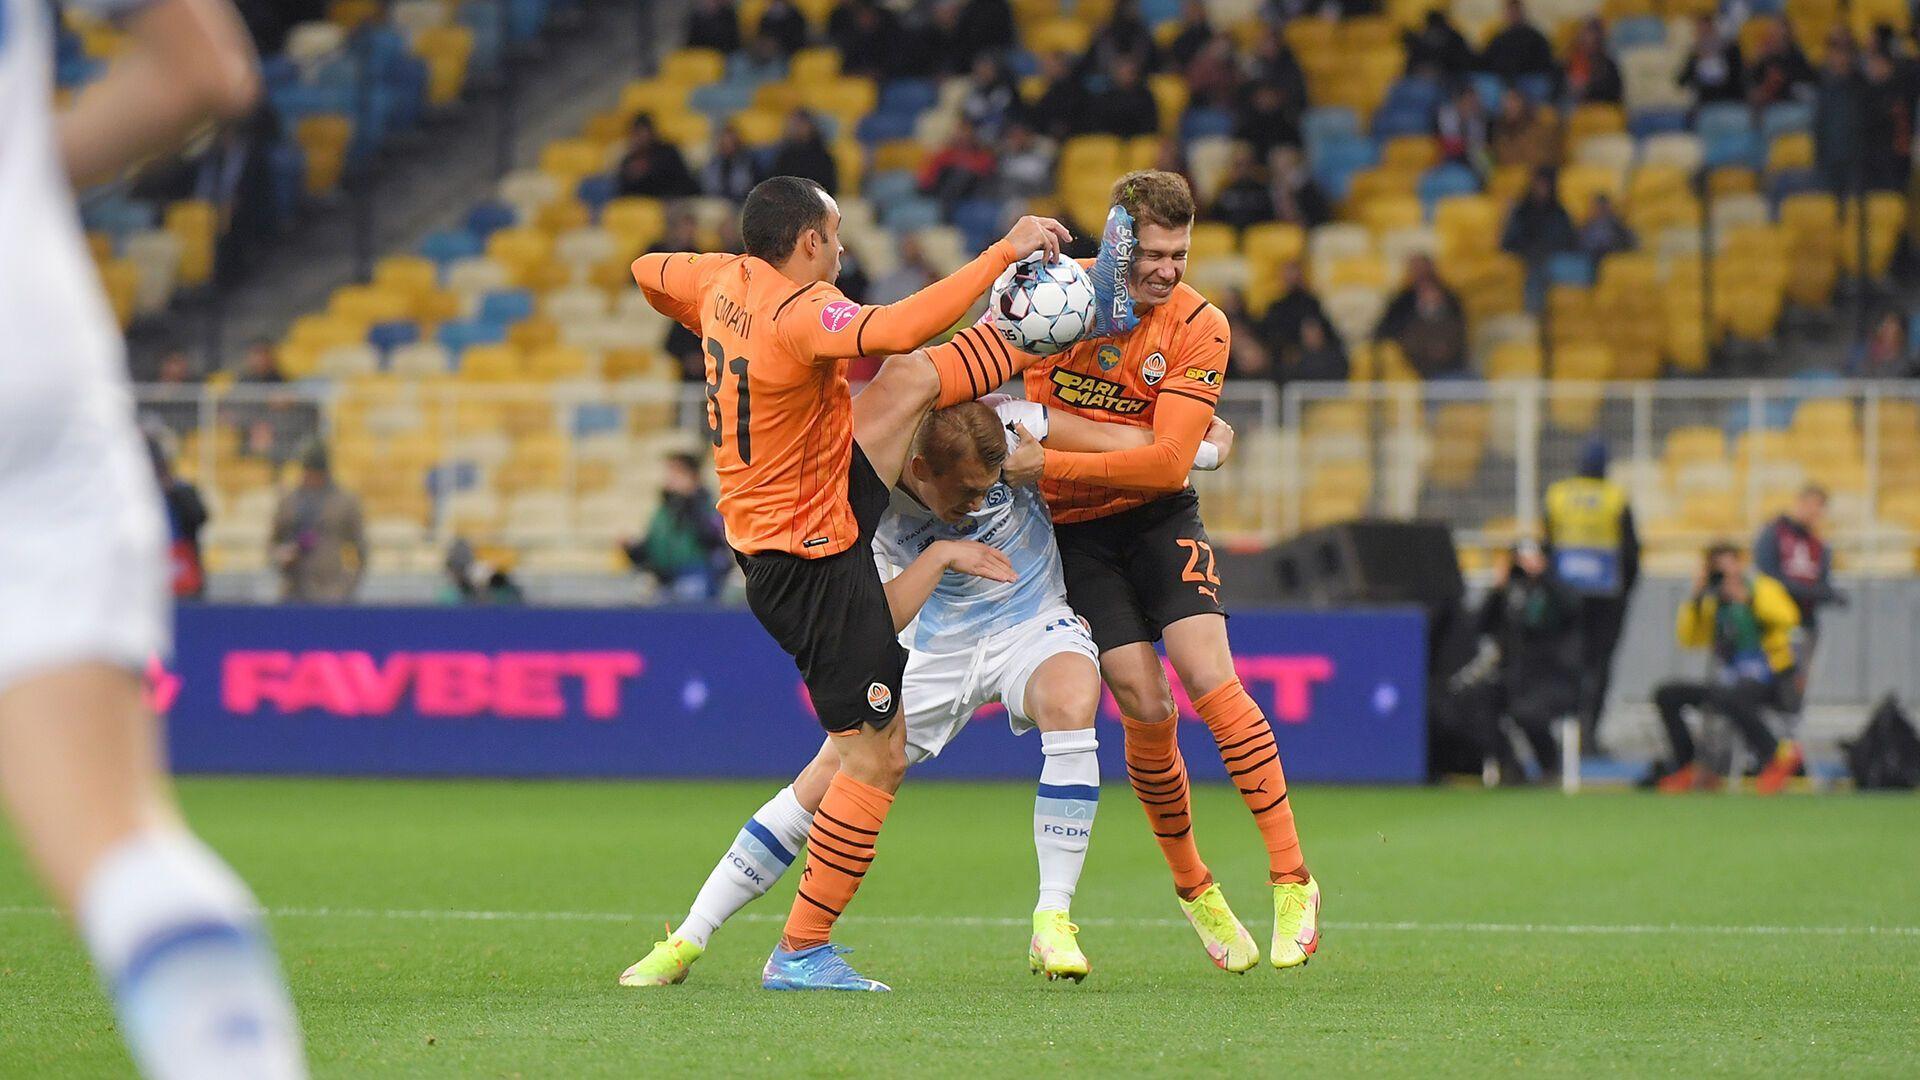 Матвиенко получил удар ногой от Исмаили